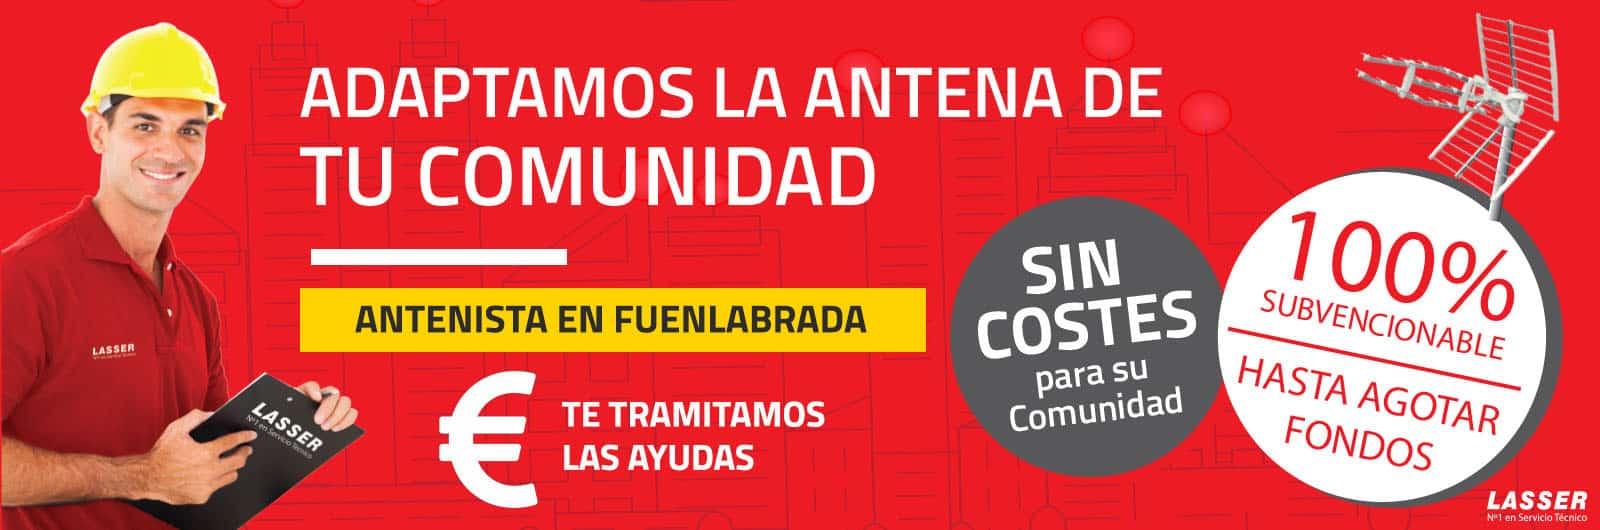 segundo-dividendo-digital-antena-comunidades-promocion-fuenlabrada